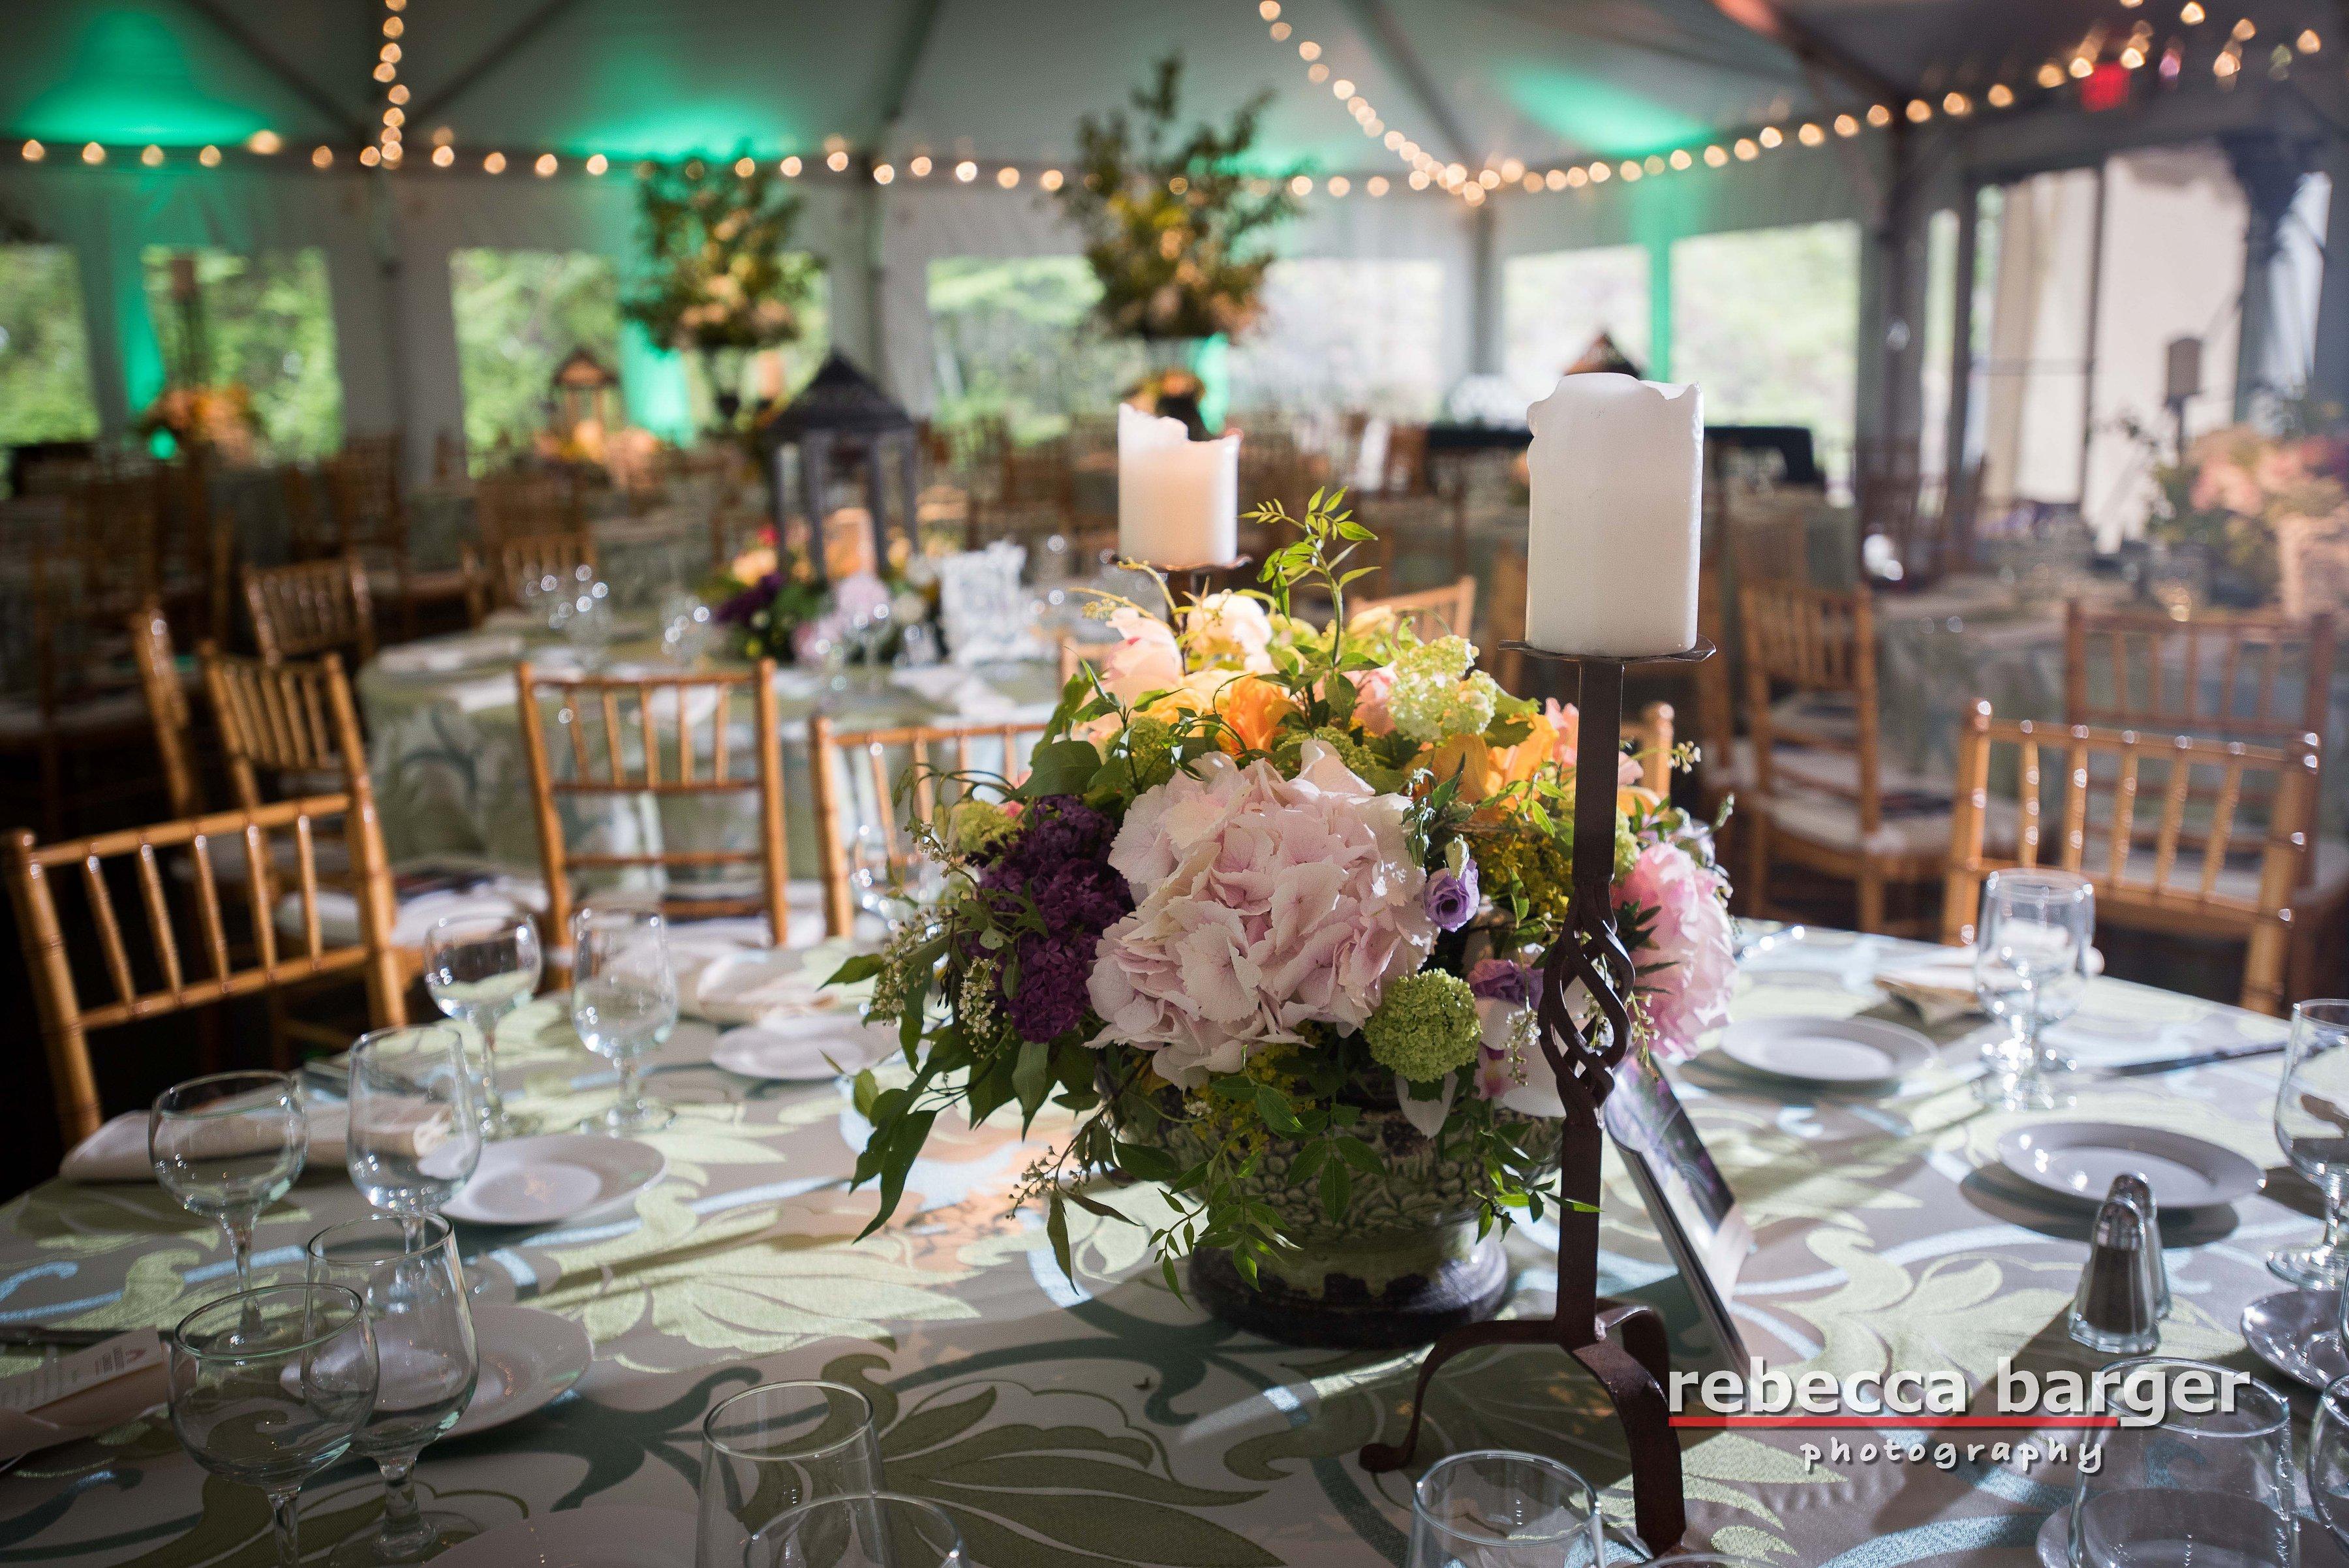 The Barn at Ridgeland Wedding Venue in Philadelphia, PA ...